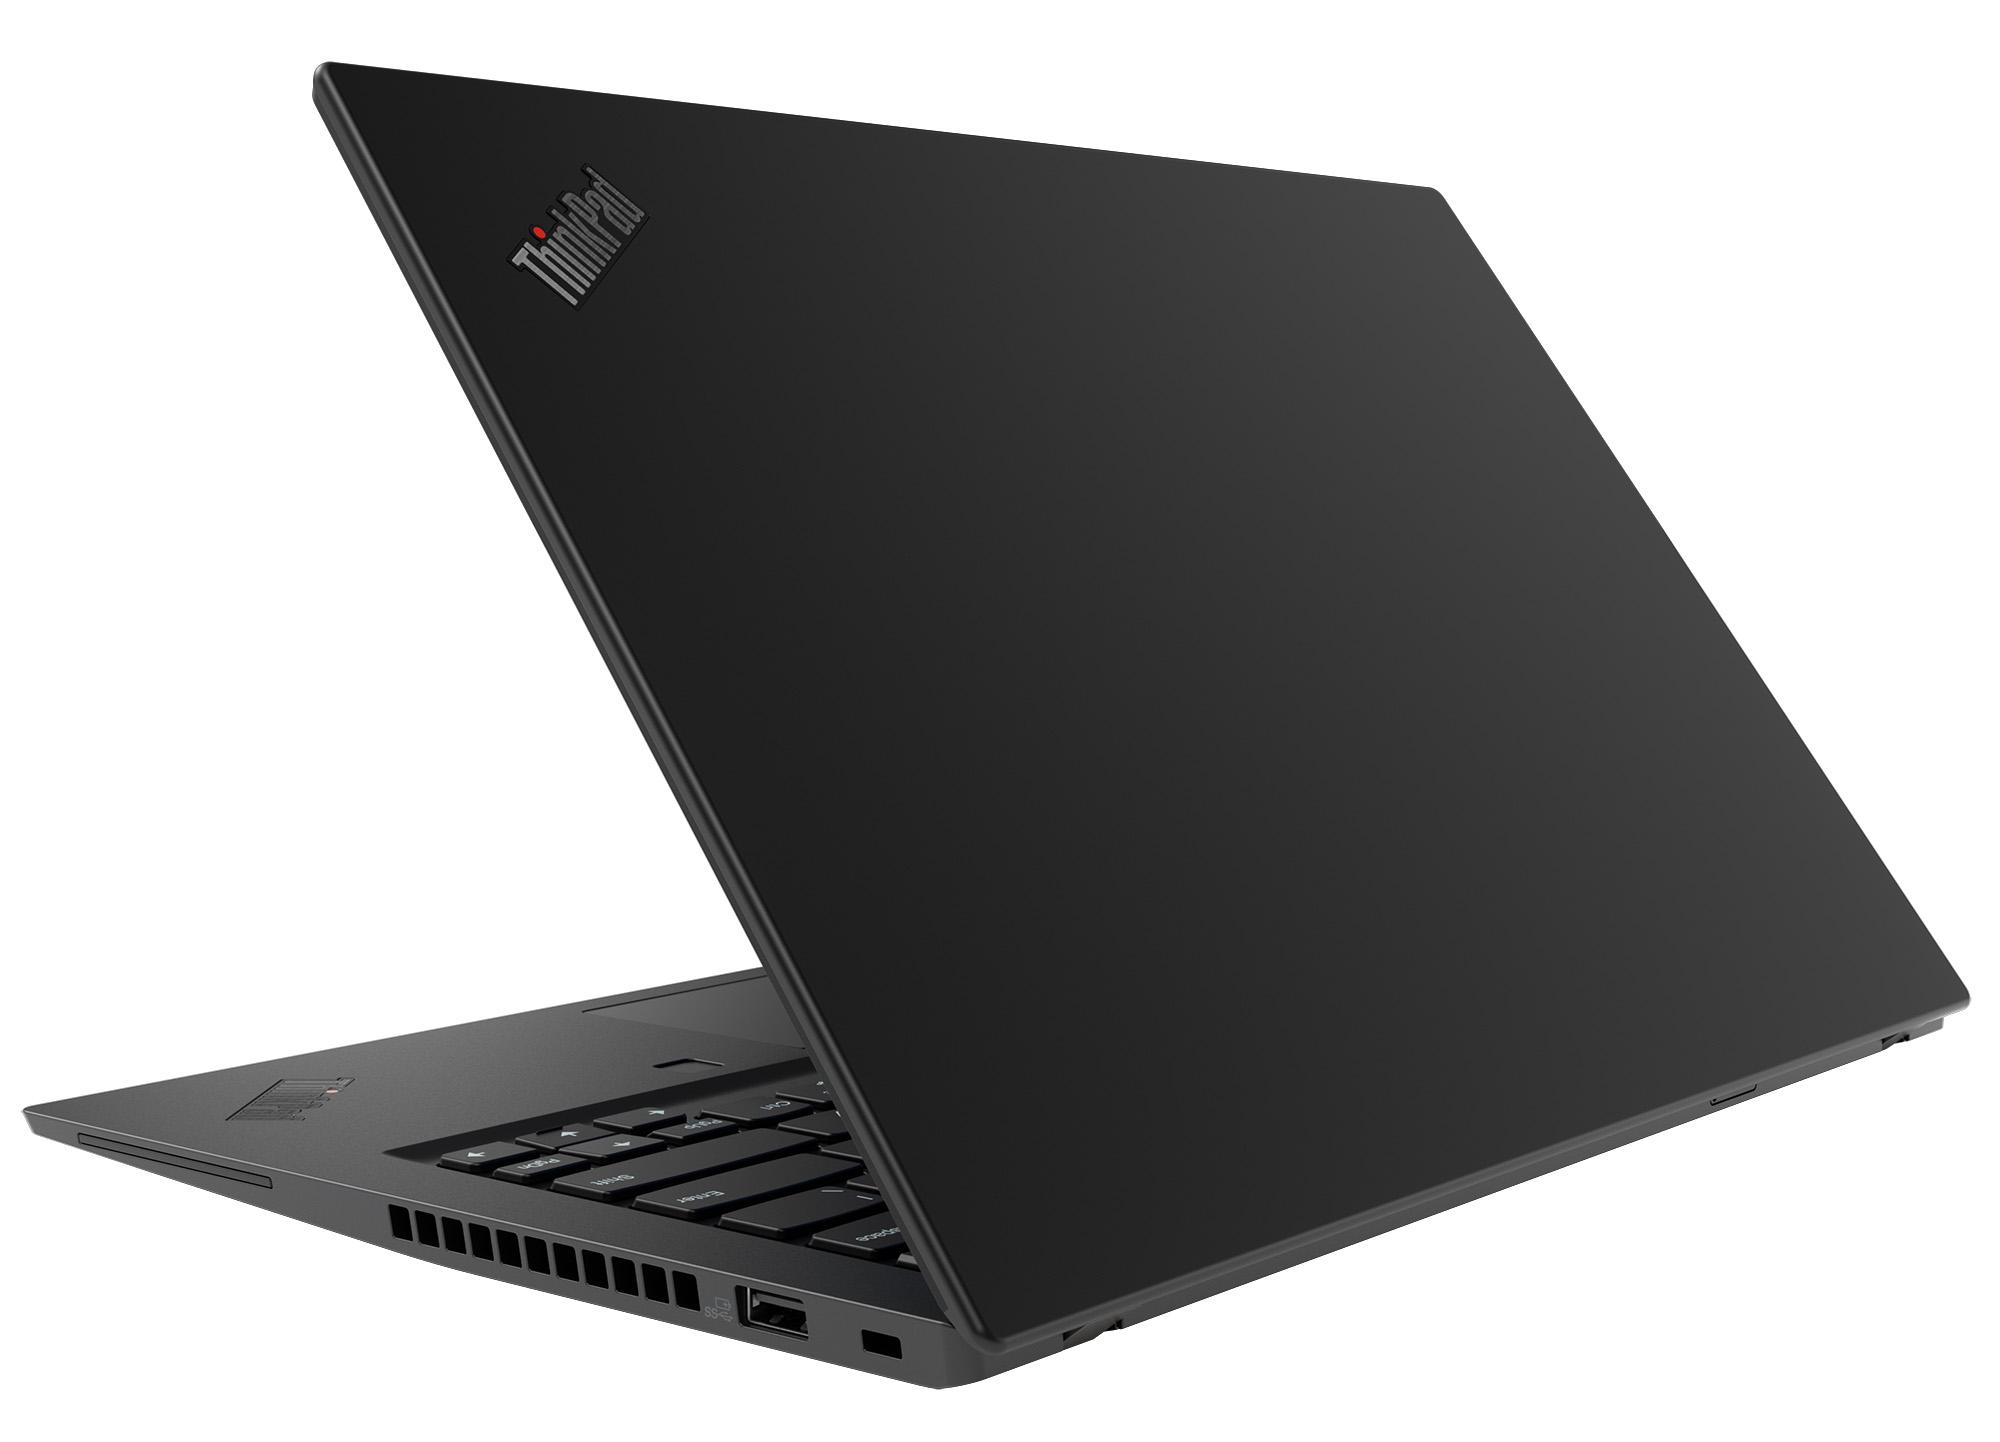 Фото  Ноутбук ThinkPad T14s 1st Gen (20T00016RT)